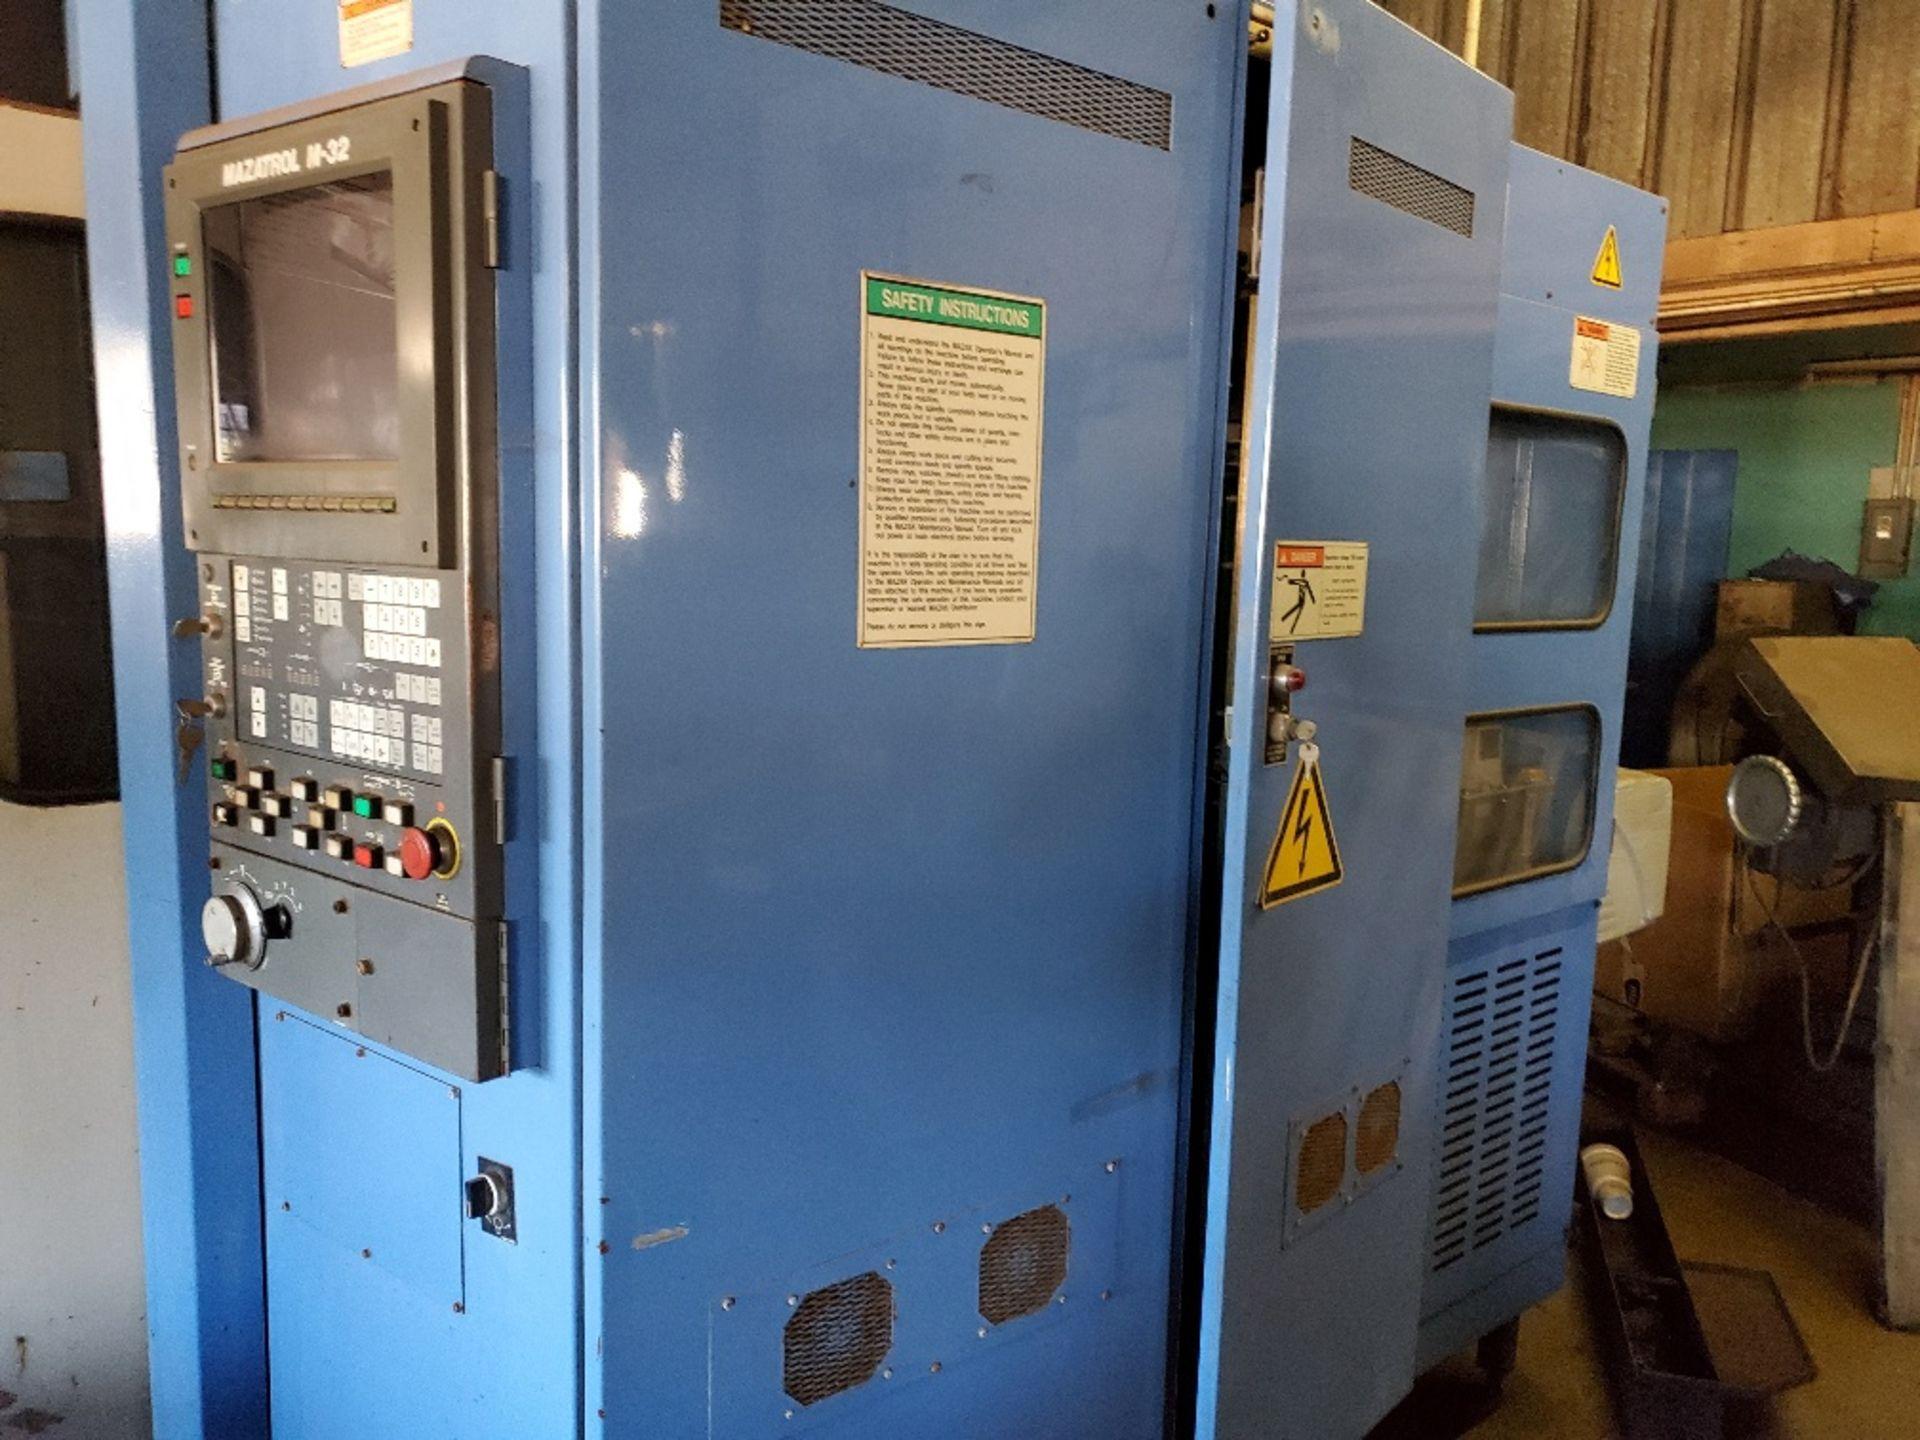 MAZAK AJV 25-405 MACHINING CENTER W/ MAZATROL M-32 CTRL (LOCATION: 5702 W 7TH ST, WAKE VILLLAGE, TX - Image 2 of 3